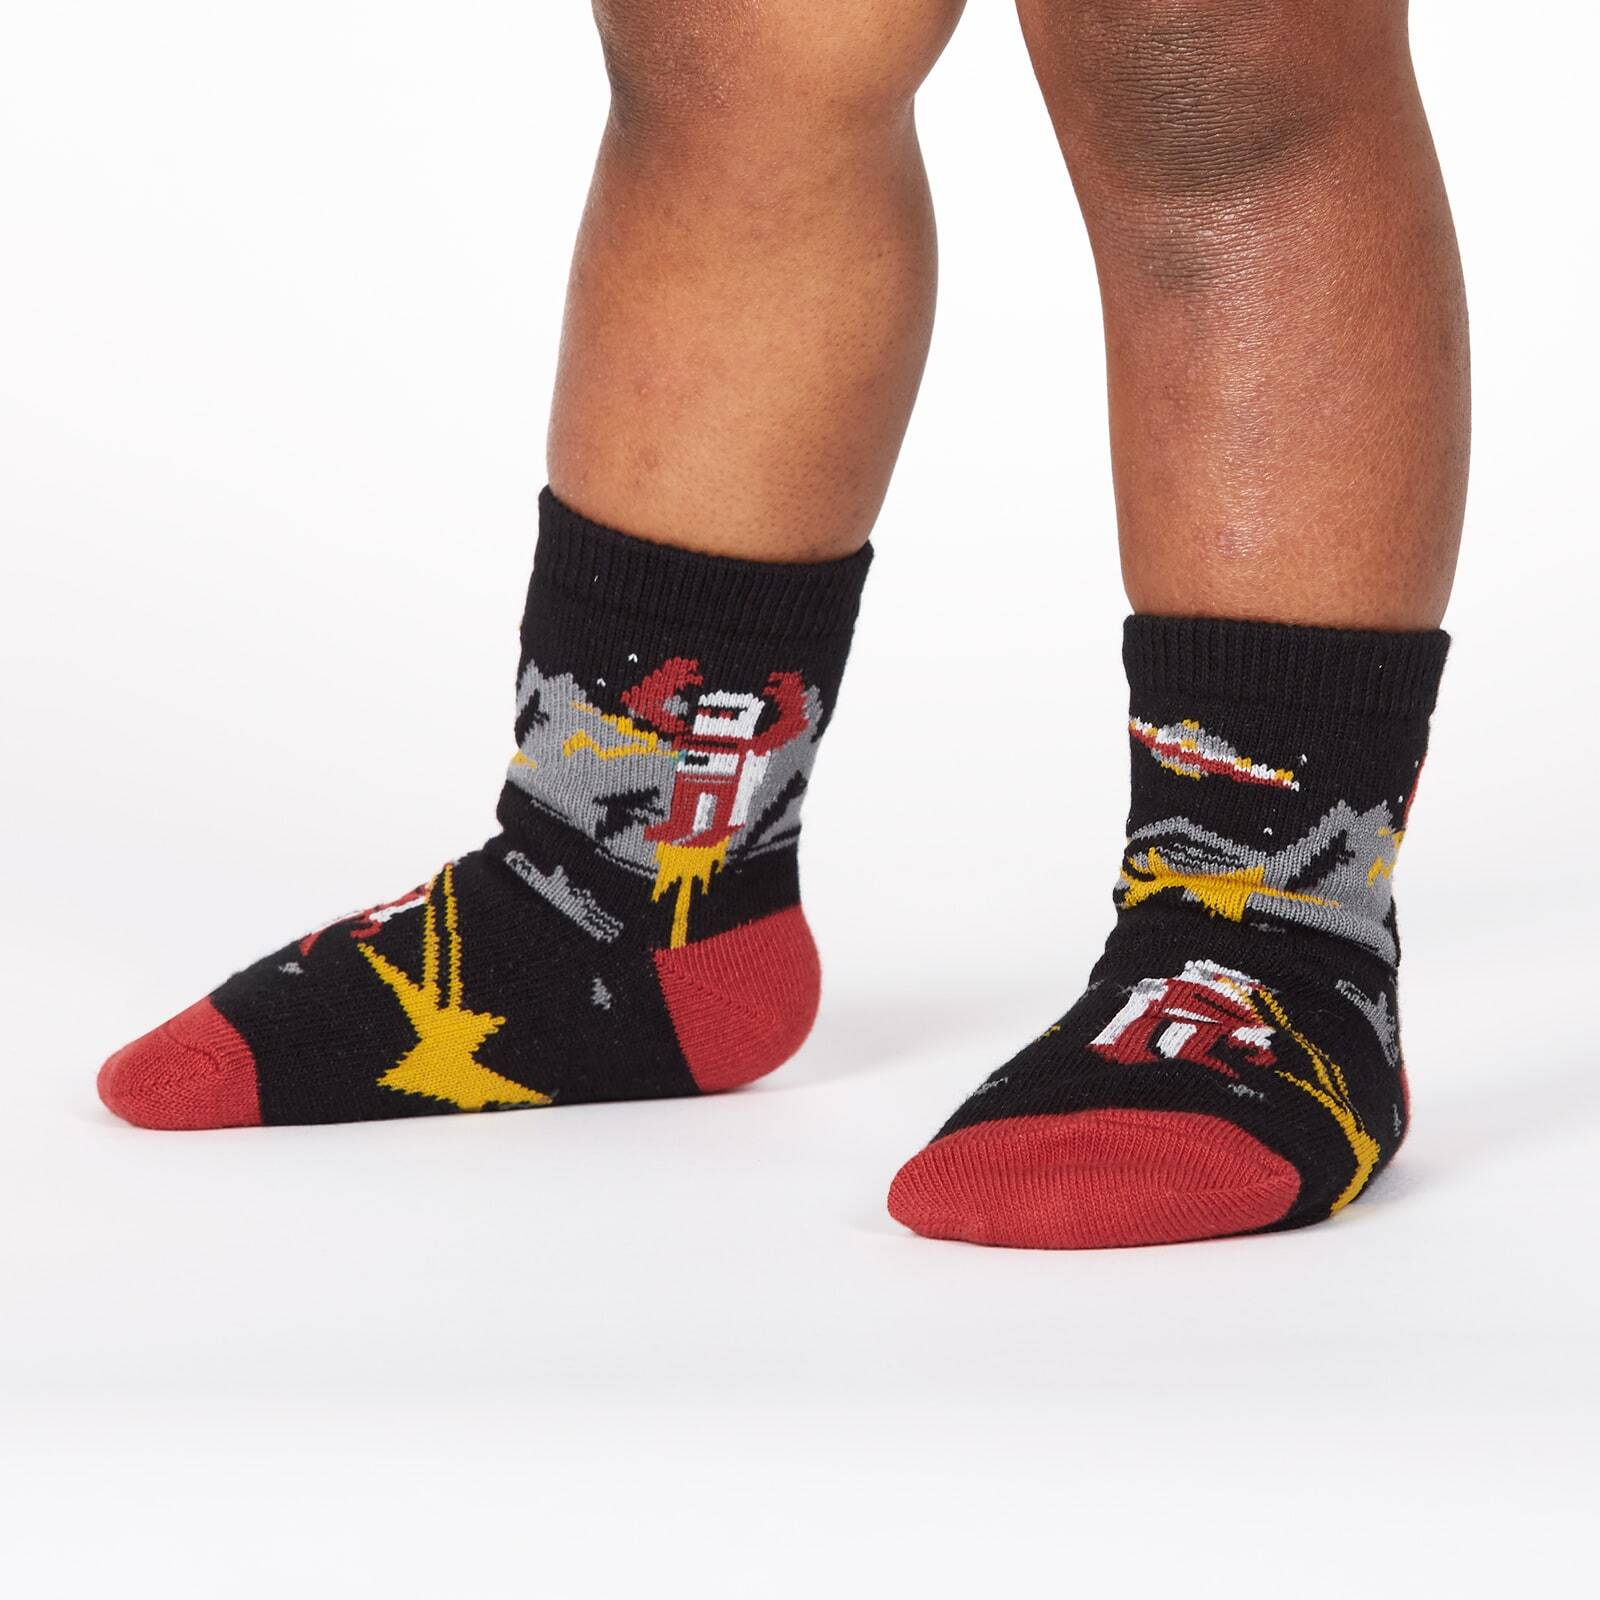 model wearing Zap! Zap! - Destructive Robots Dogs and UFOs Crew Socks Black - Toddler